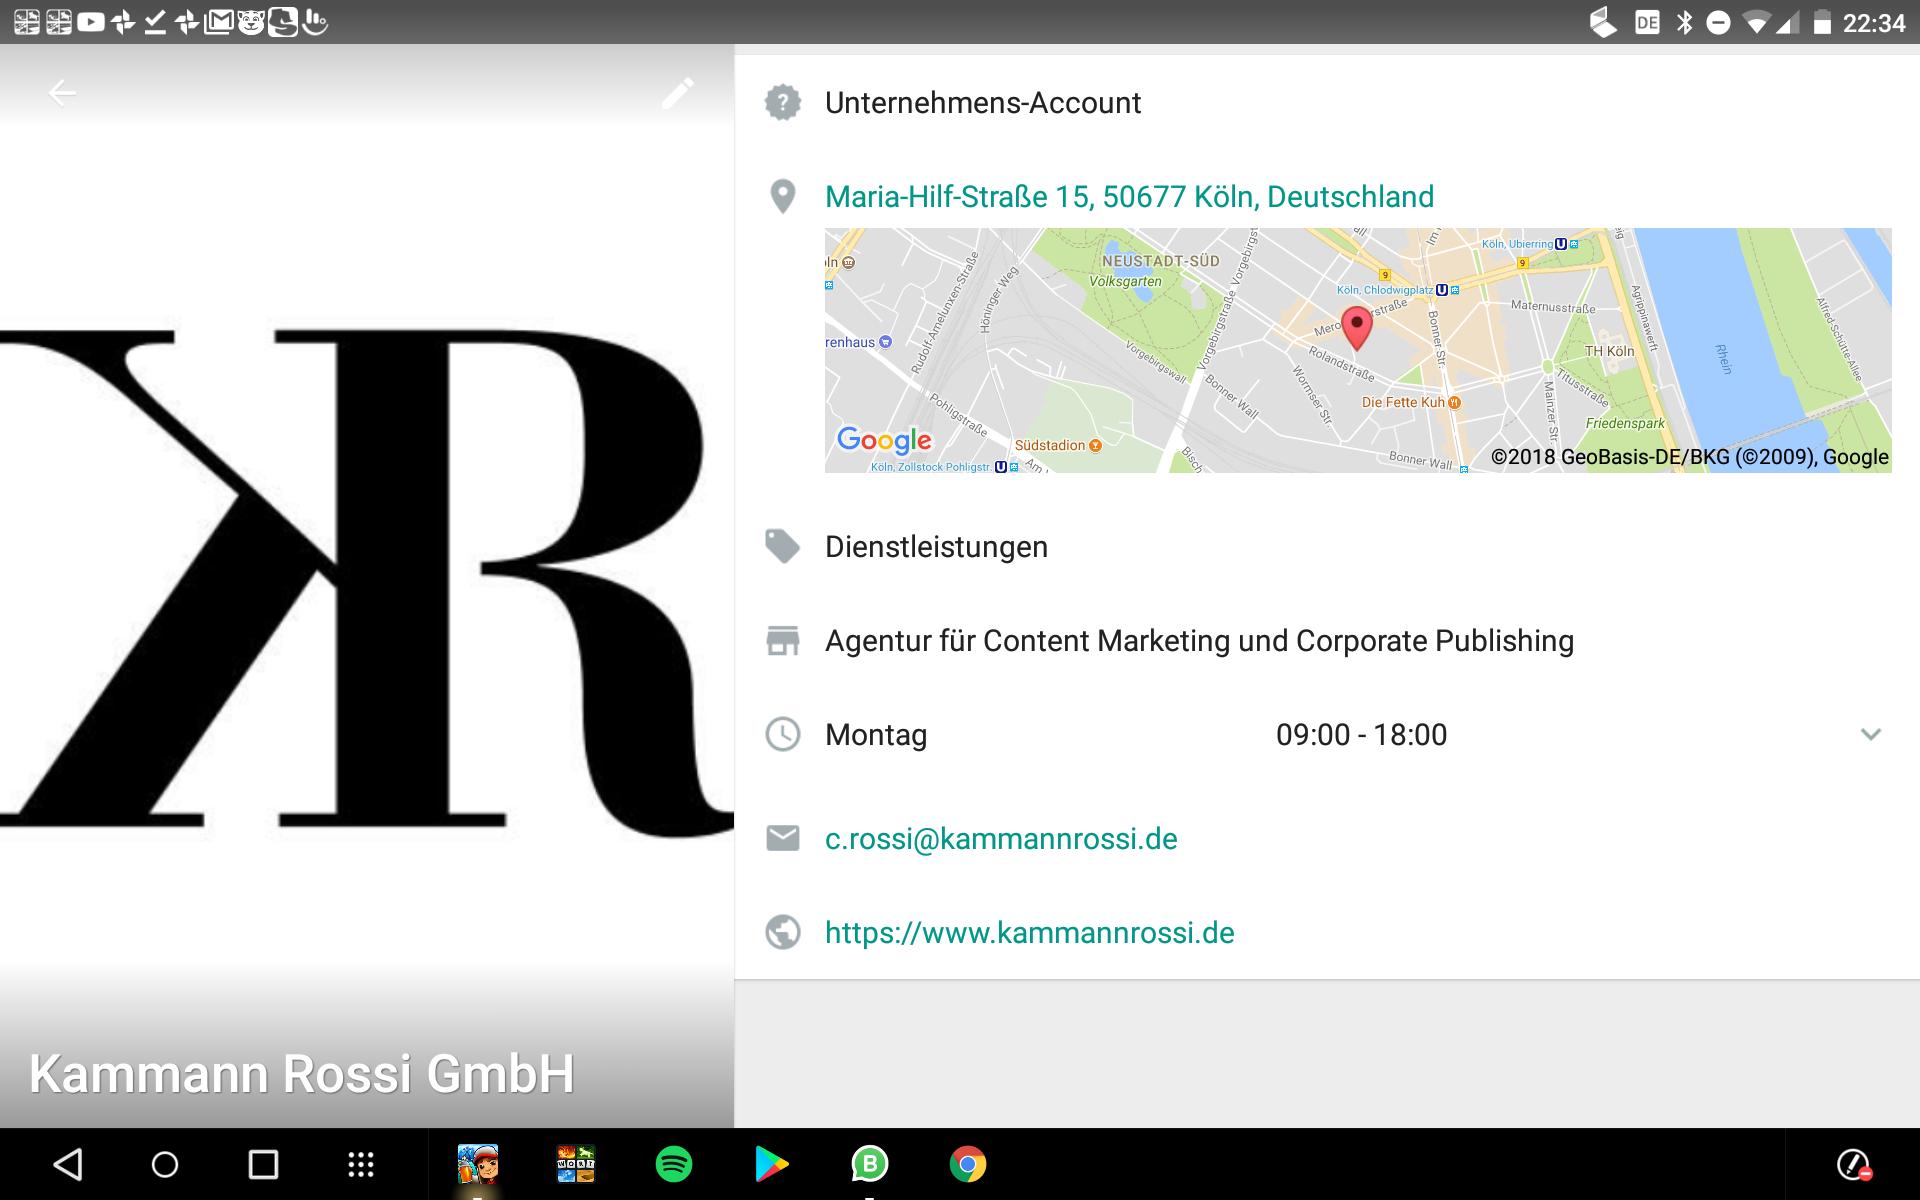 Whats App Business: Der Content Marketing Selbstversuch (Video)